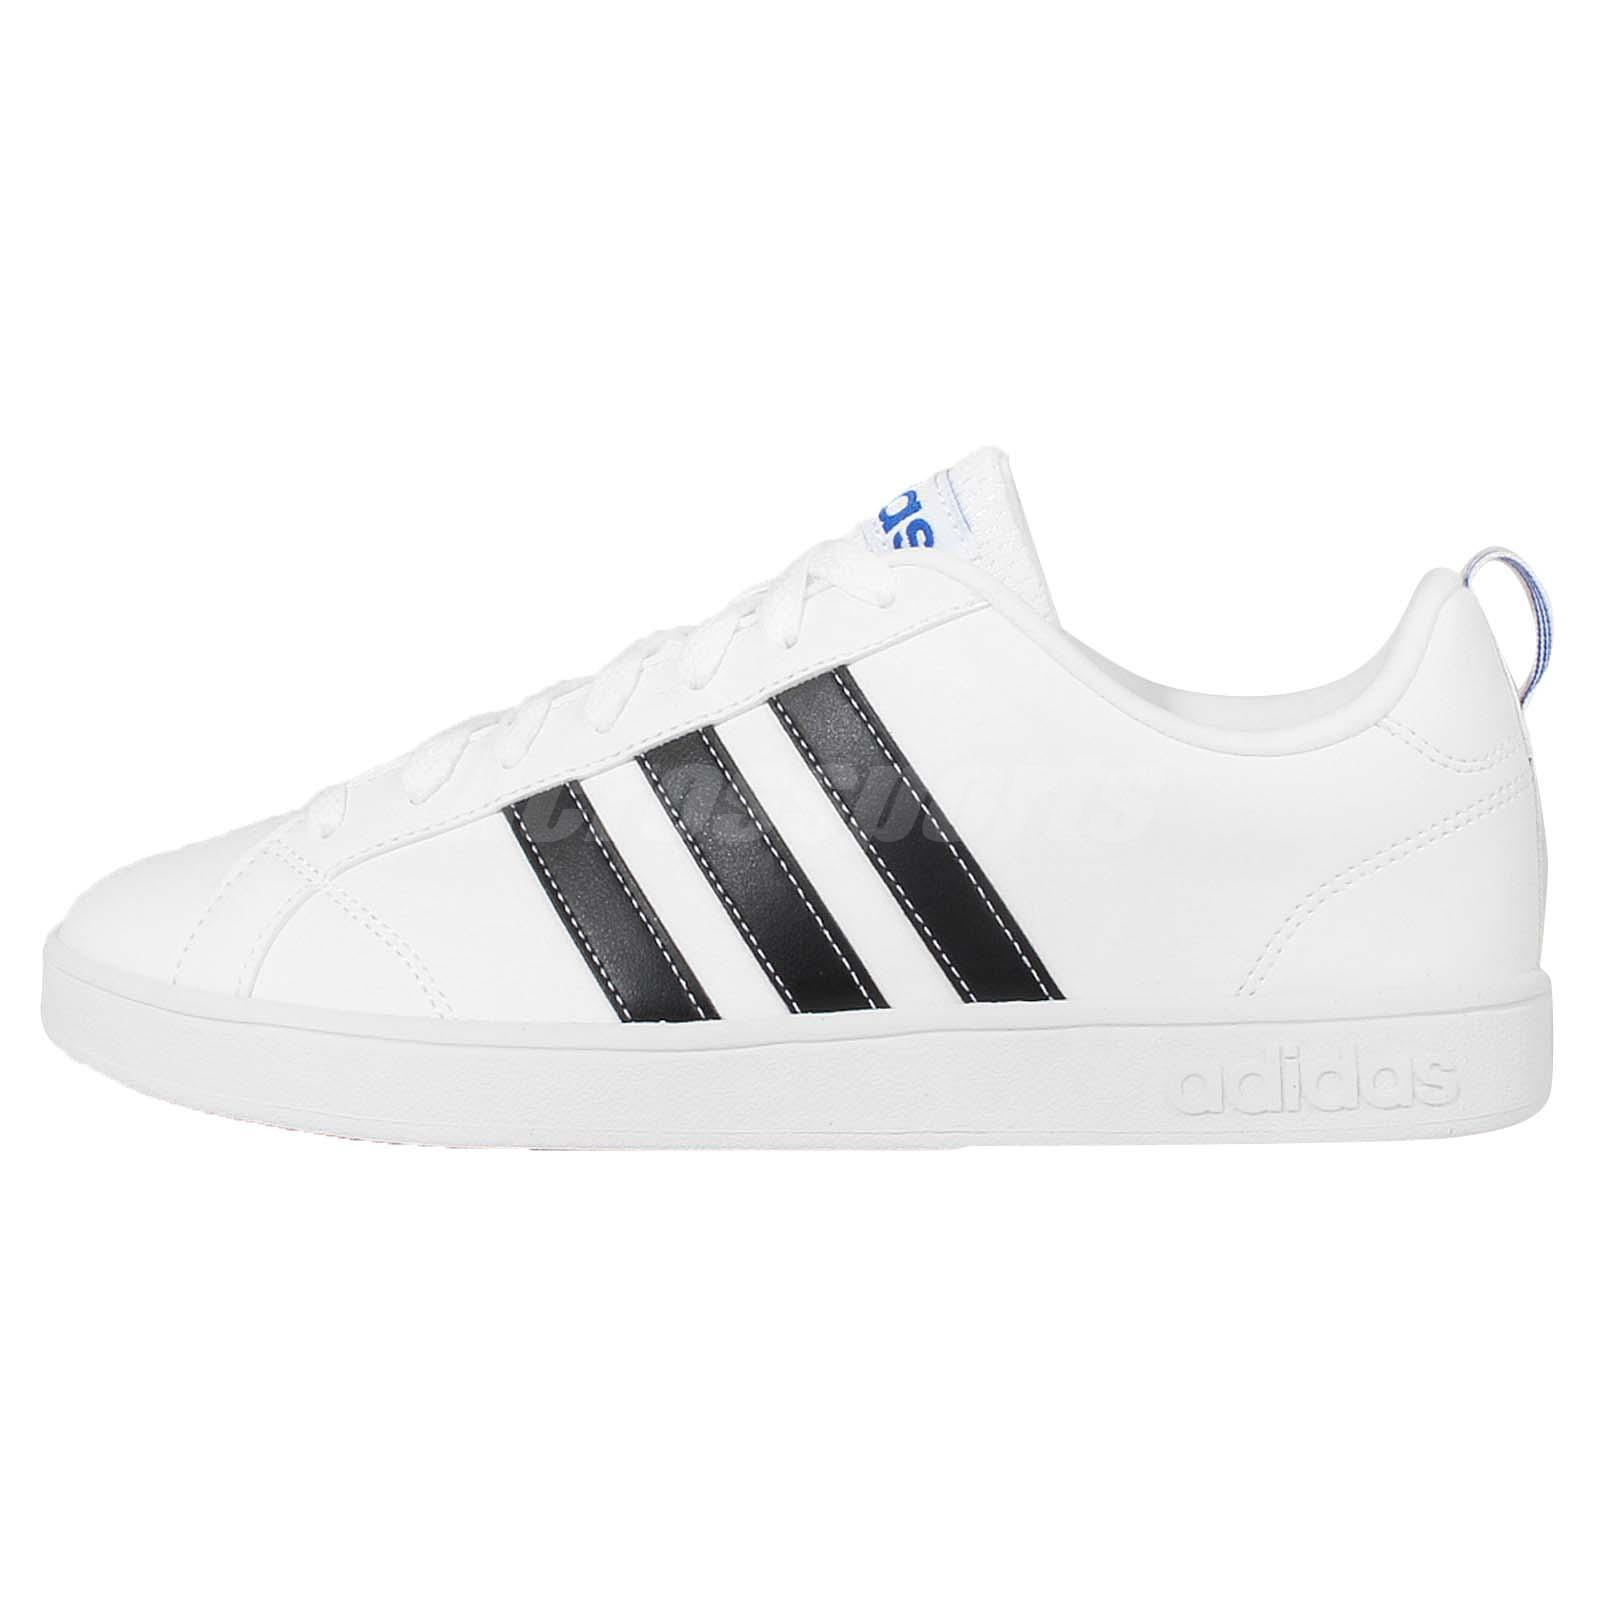 adidas neo label white shoes. Black Bedroom Furniture Sets. Home Design Ideas